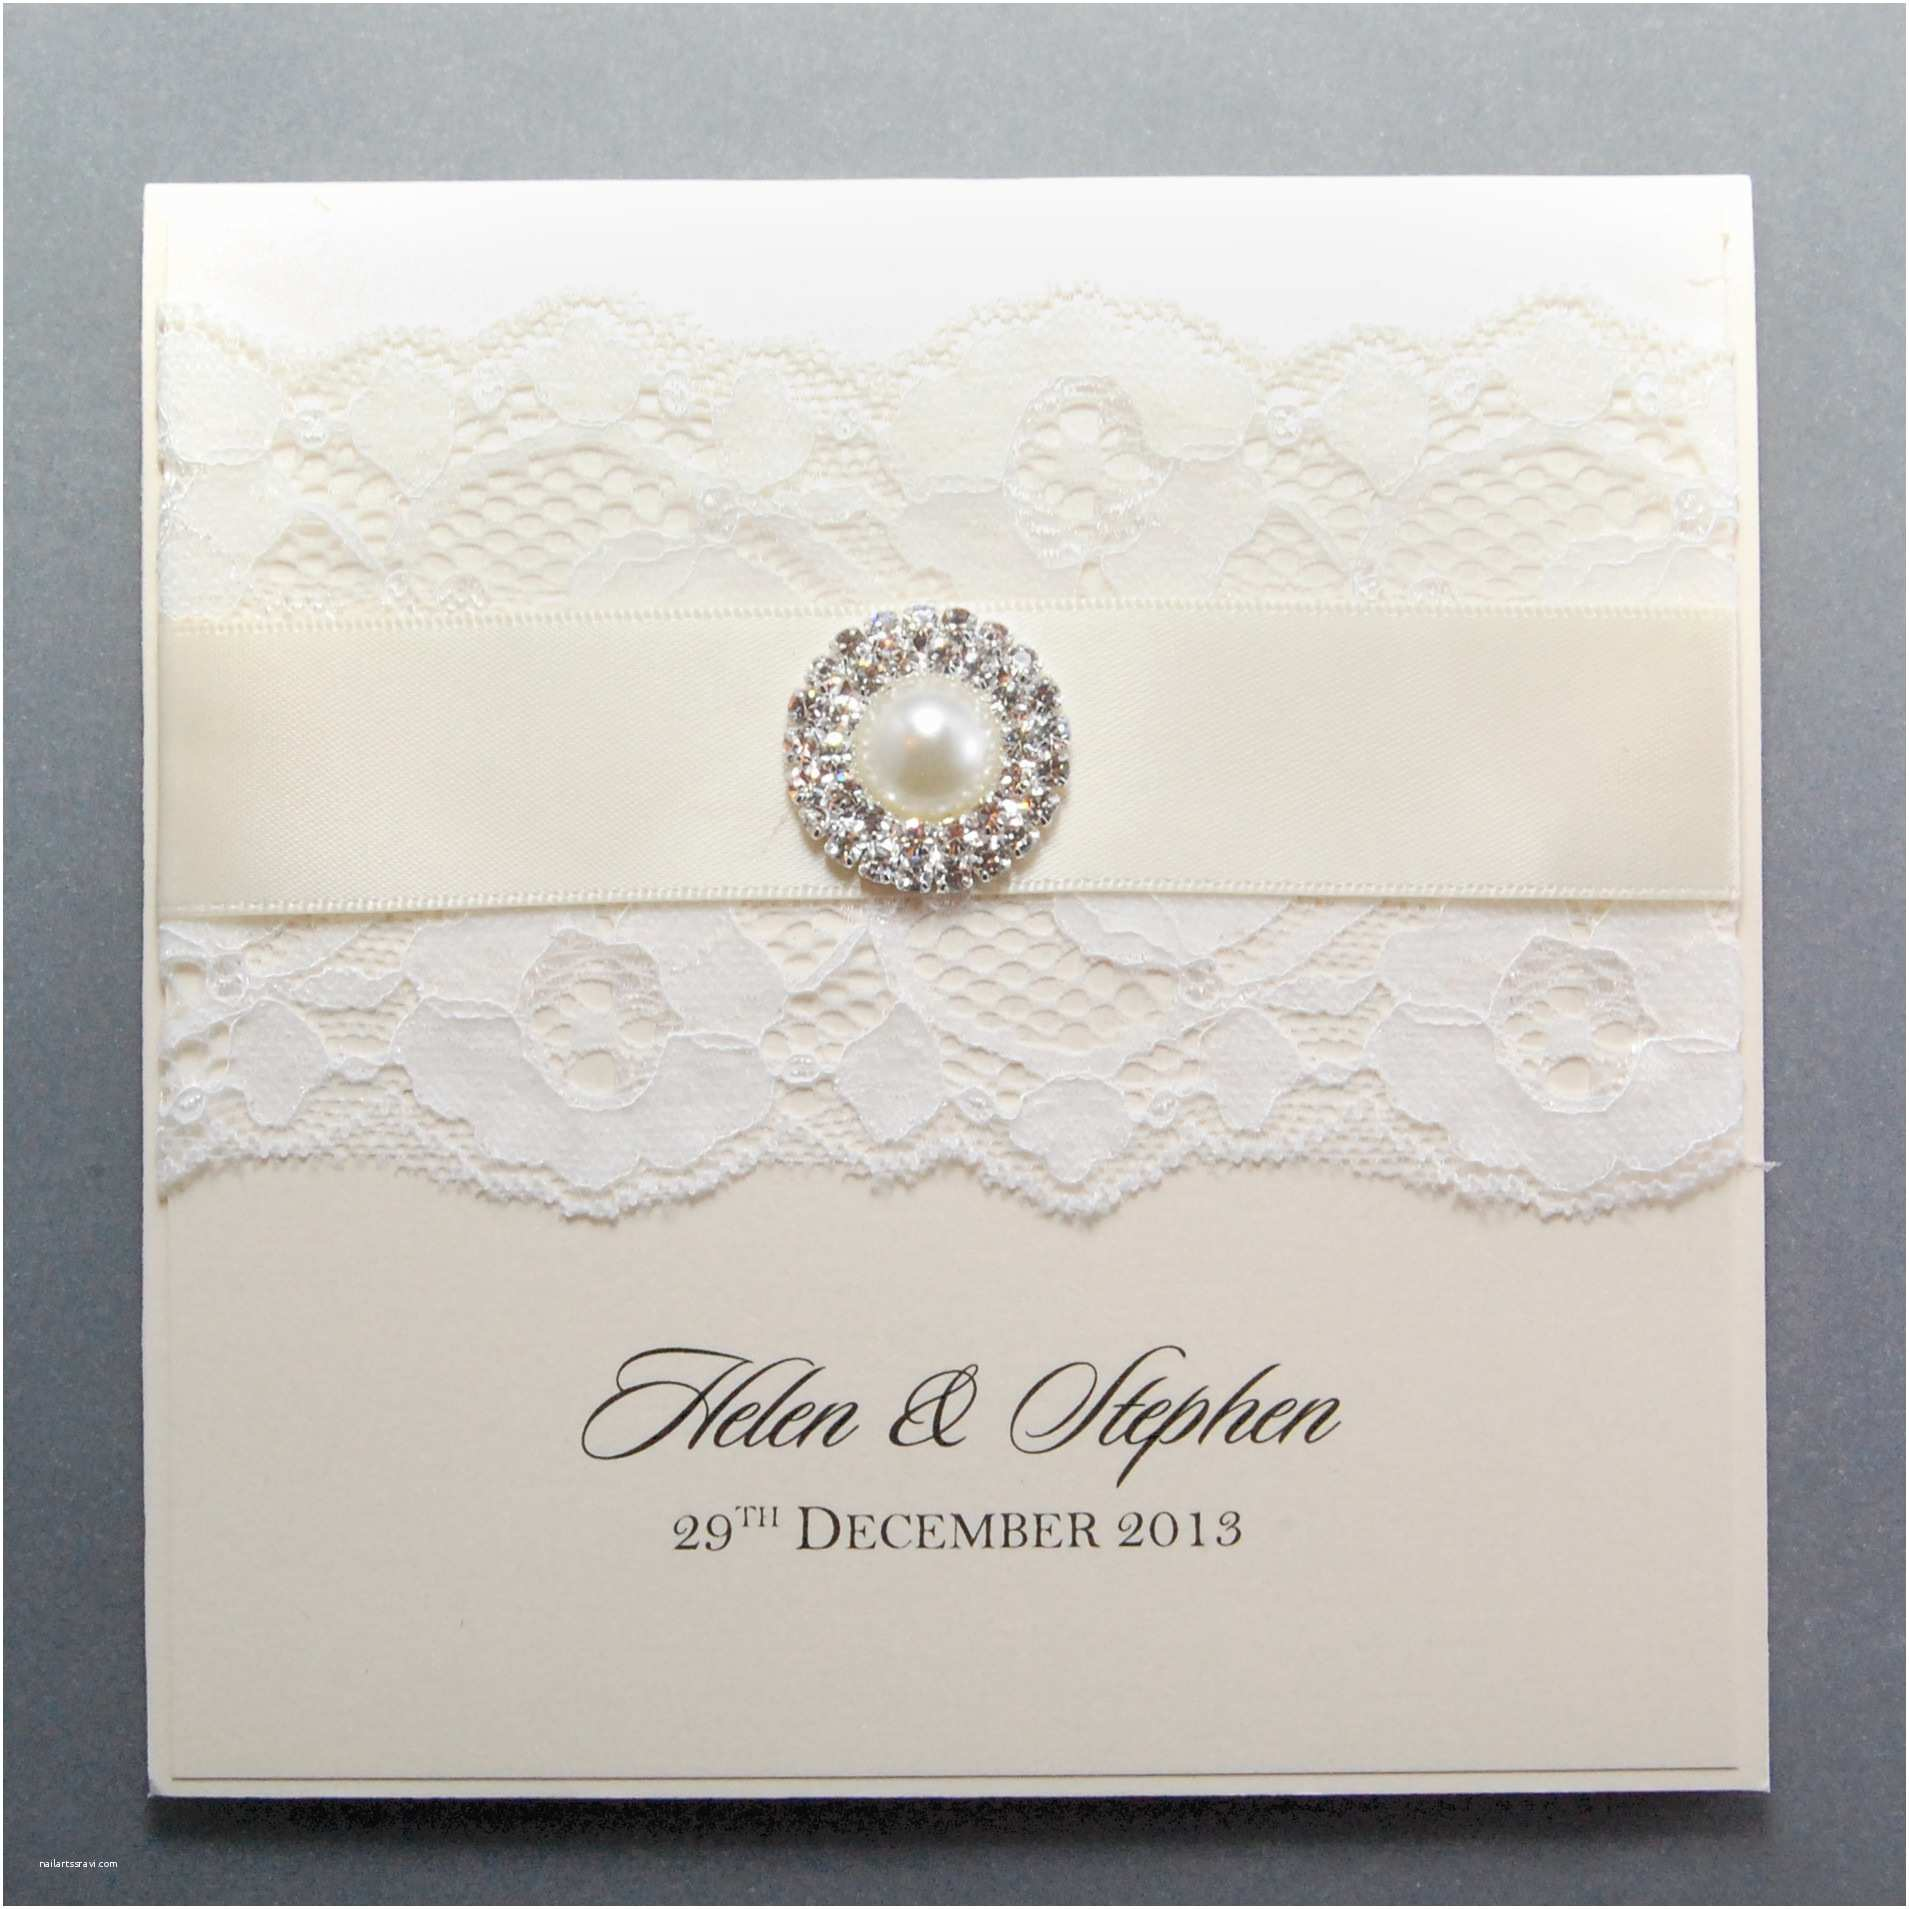 Diy Vintage Wedding Invitation Ideas 11 Fearsome Diy Lace Wedding Invitations which is